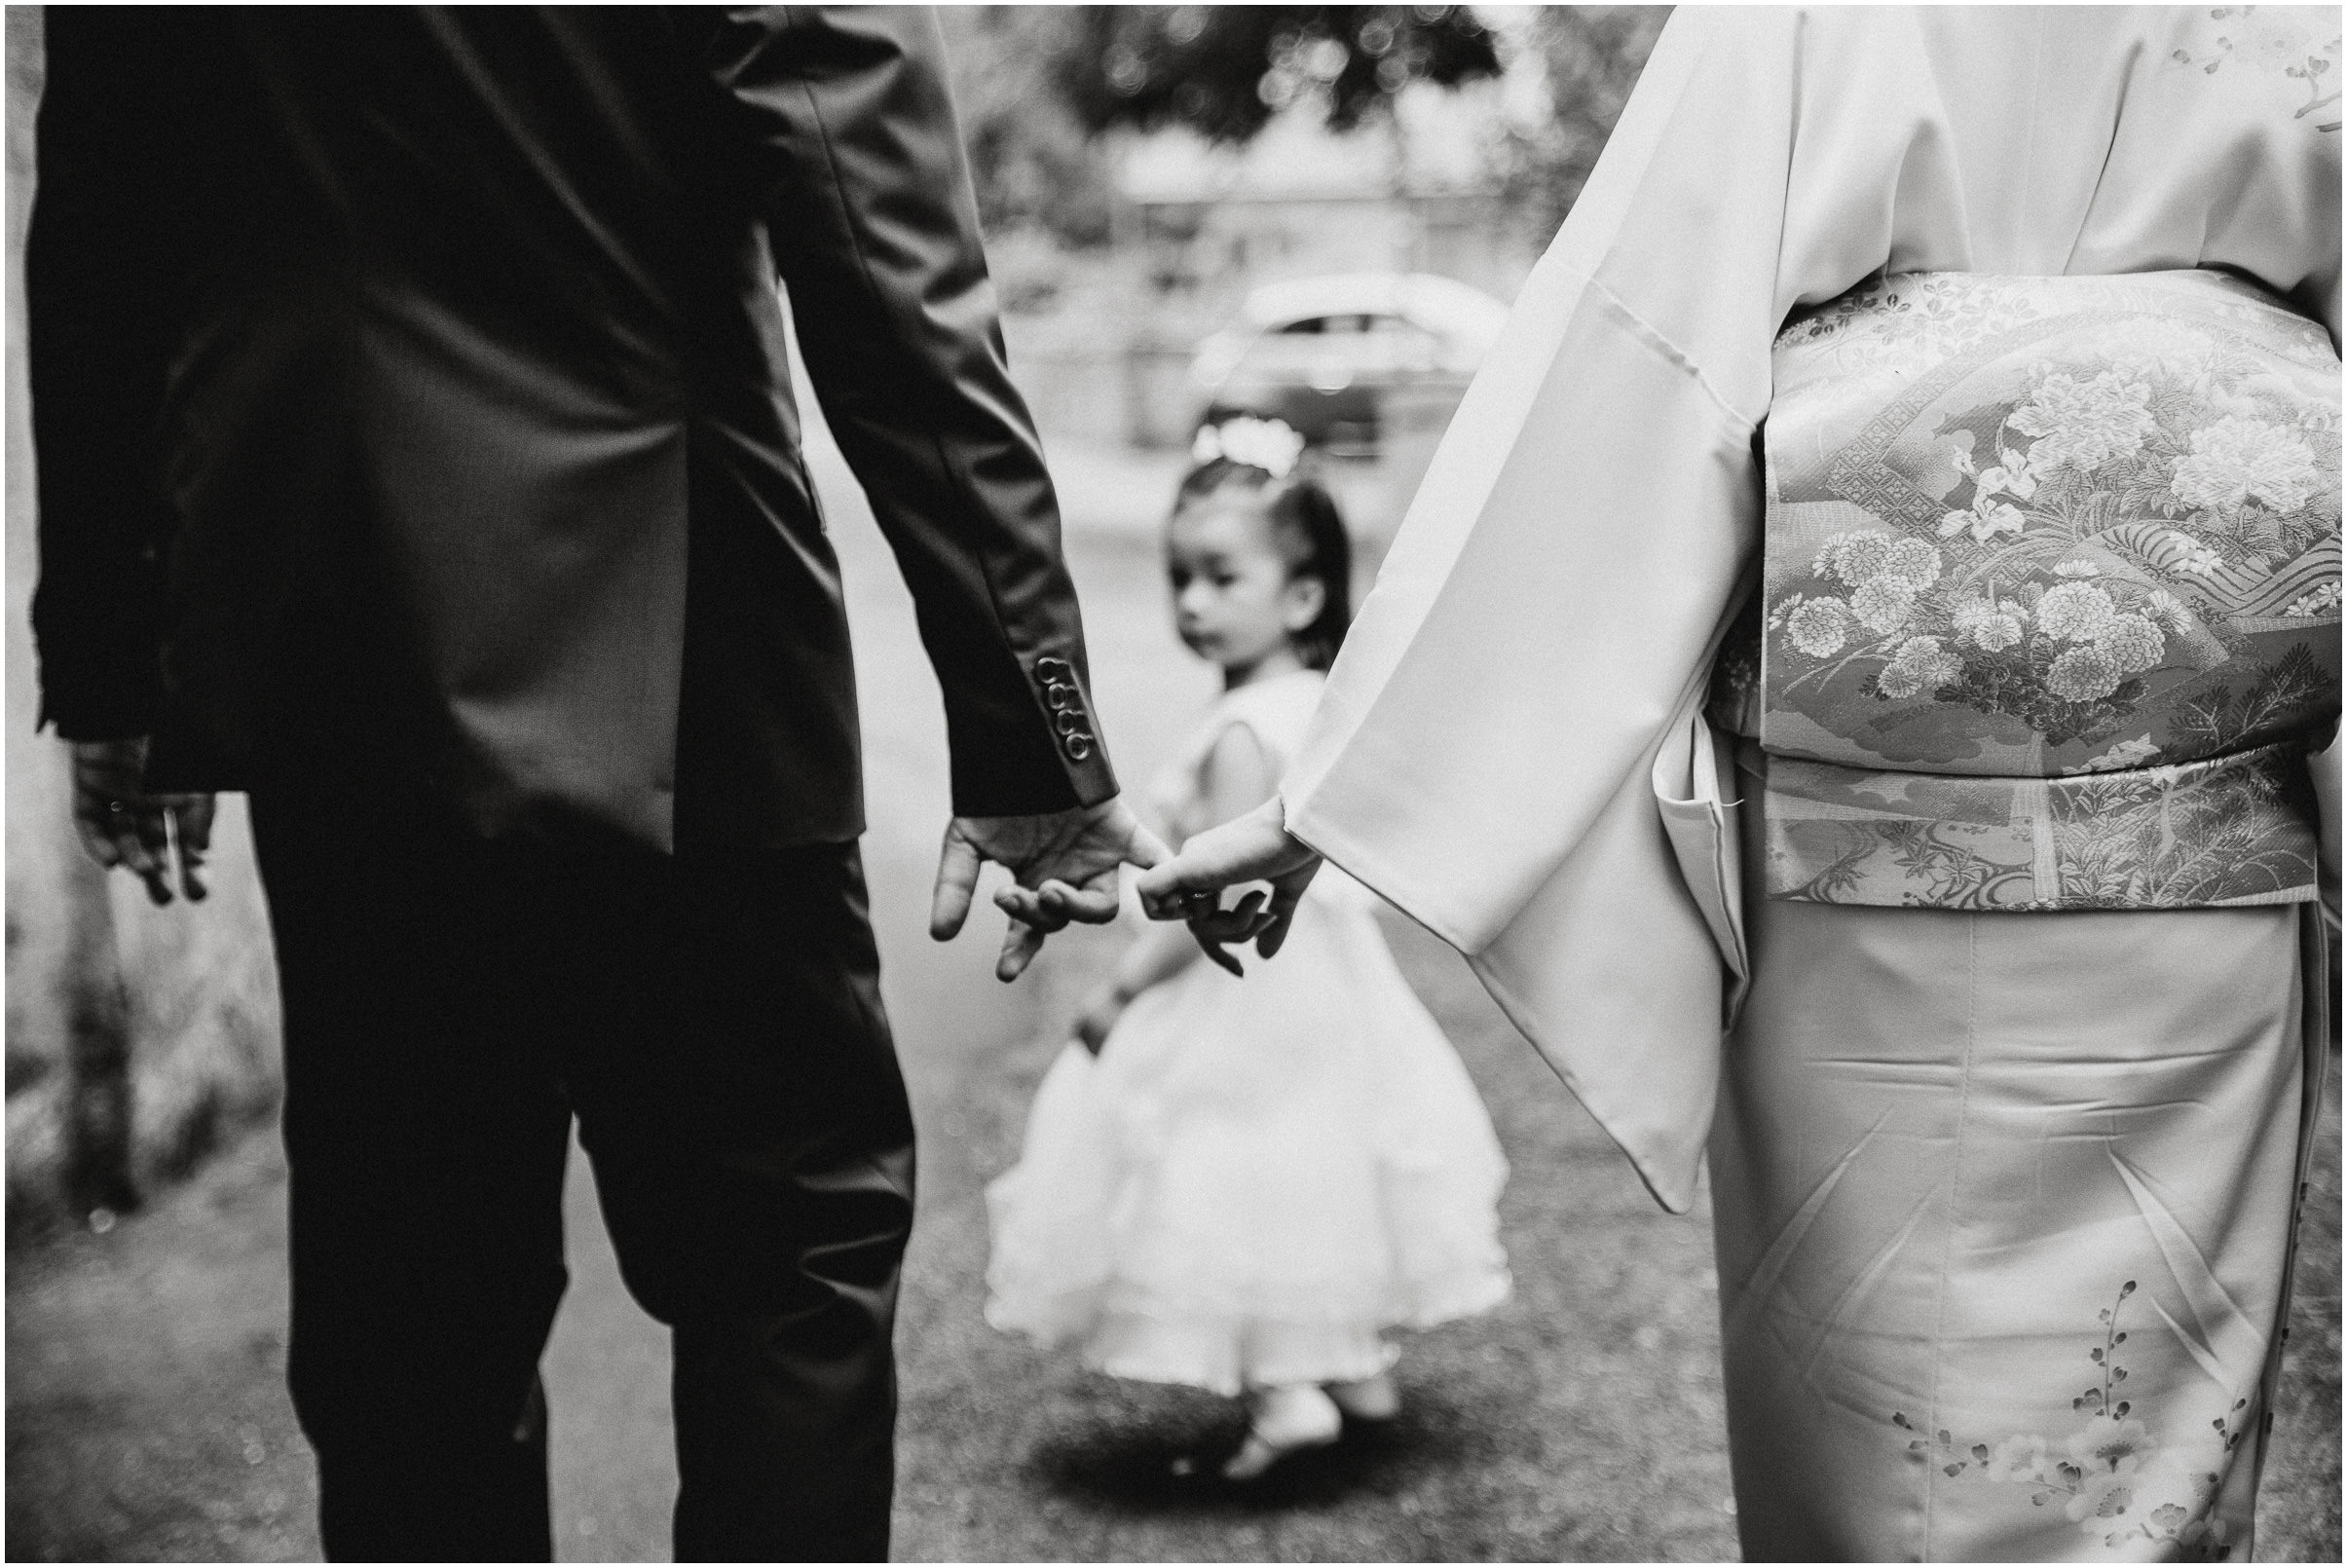 WEDDING-PHOTOGRAPHY-SARA-LORENZONI-FOTOGRAFIA-MATRIMONIO-ORVIETO-JUKA-ANTONELLO30